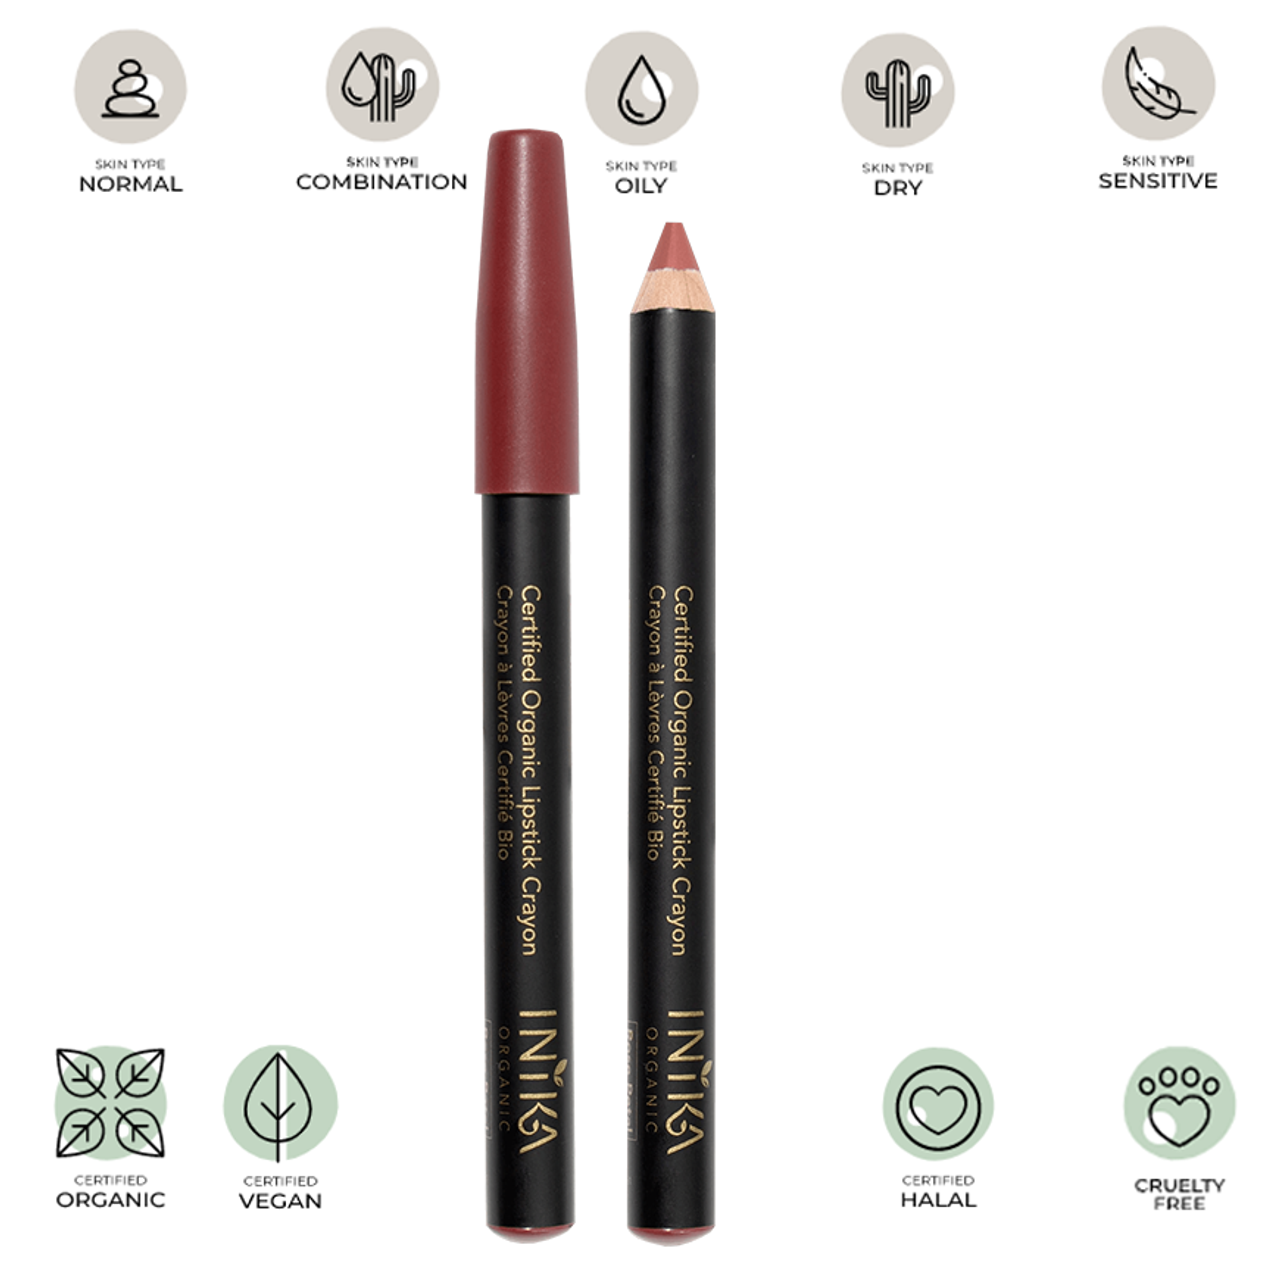 Certified Organic Lipstick Crayon (Rose Petal) 3g